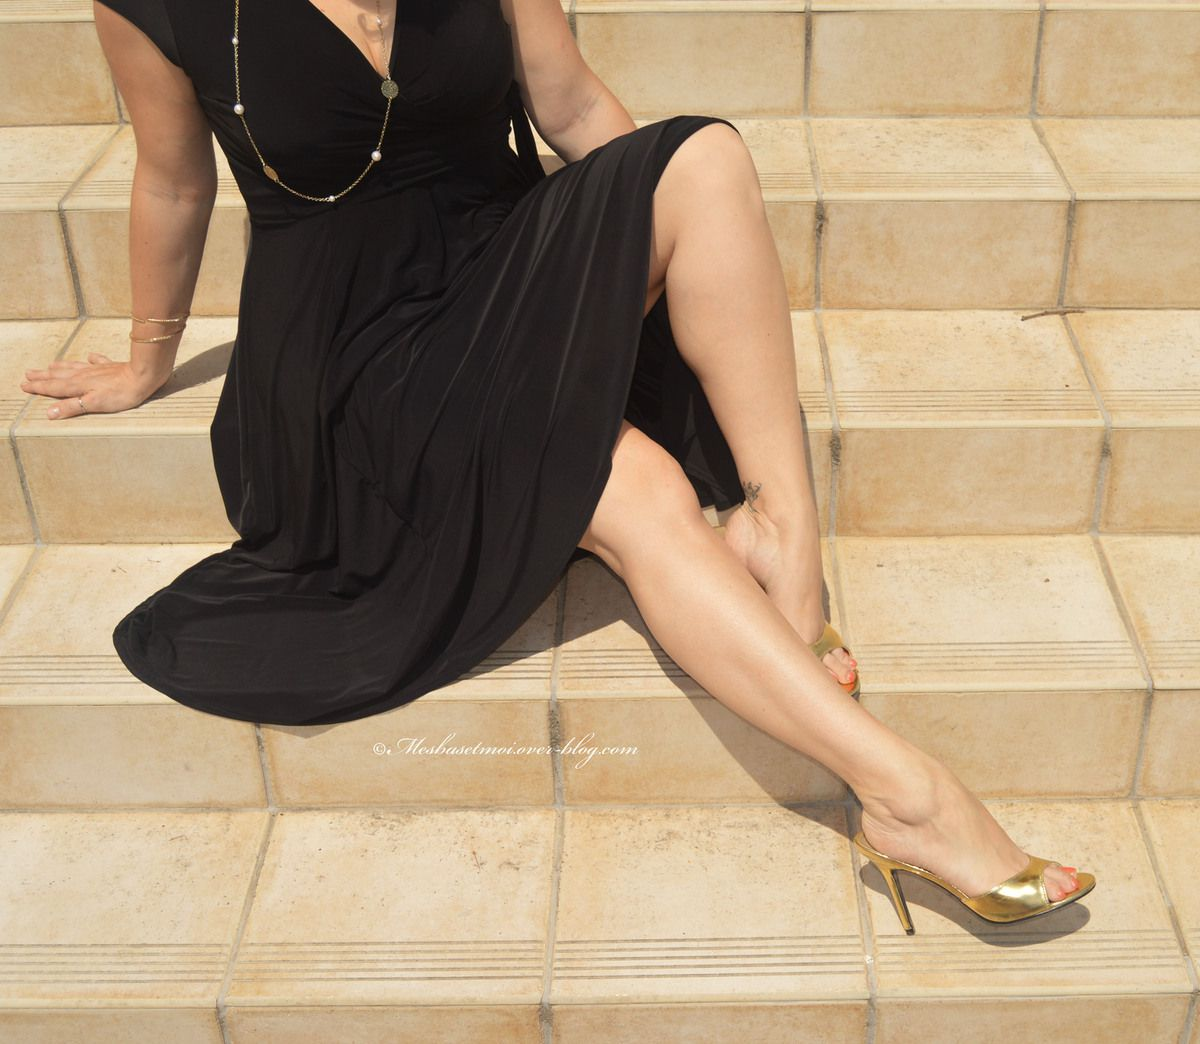 Robe TopVintage exclusive ~ Layla Cross Over Dress